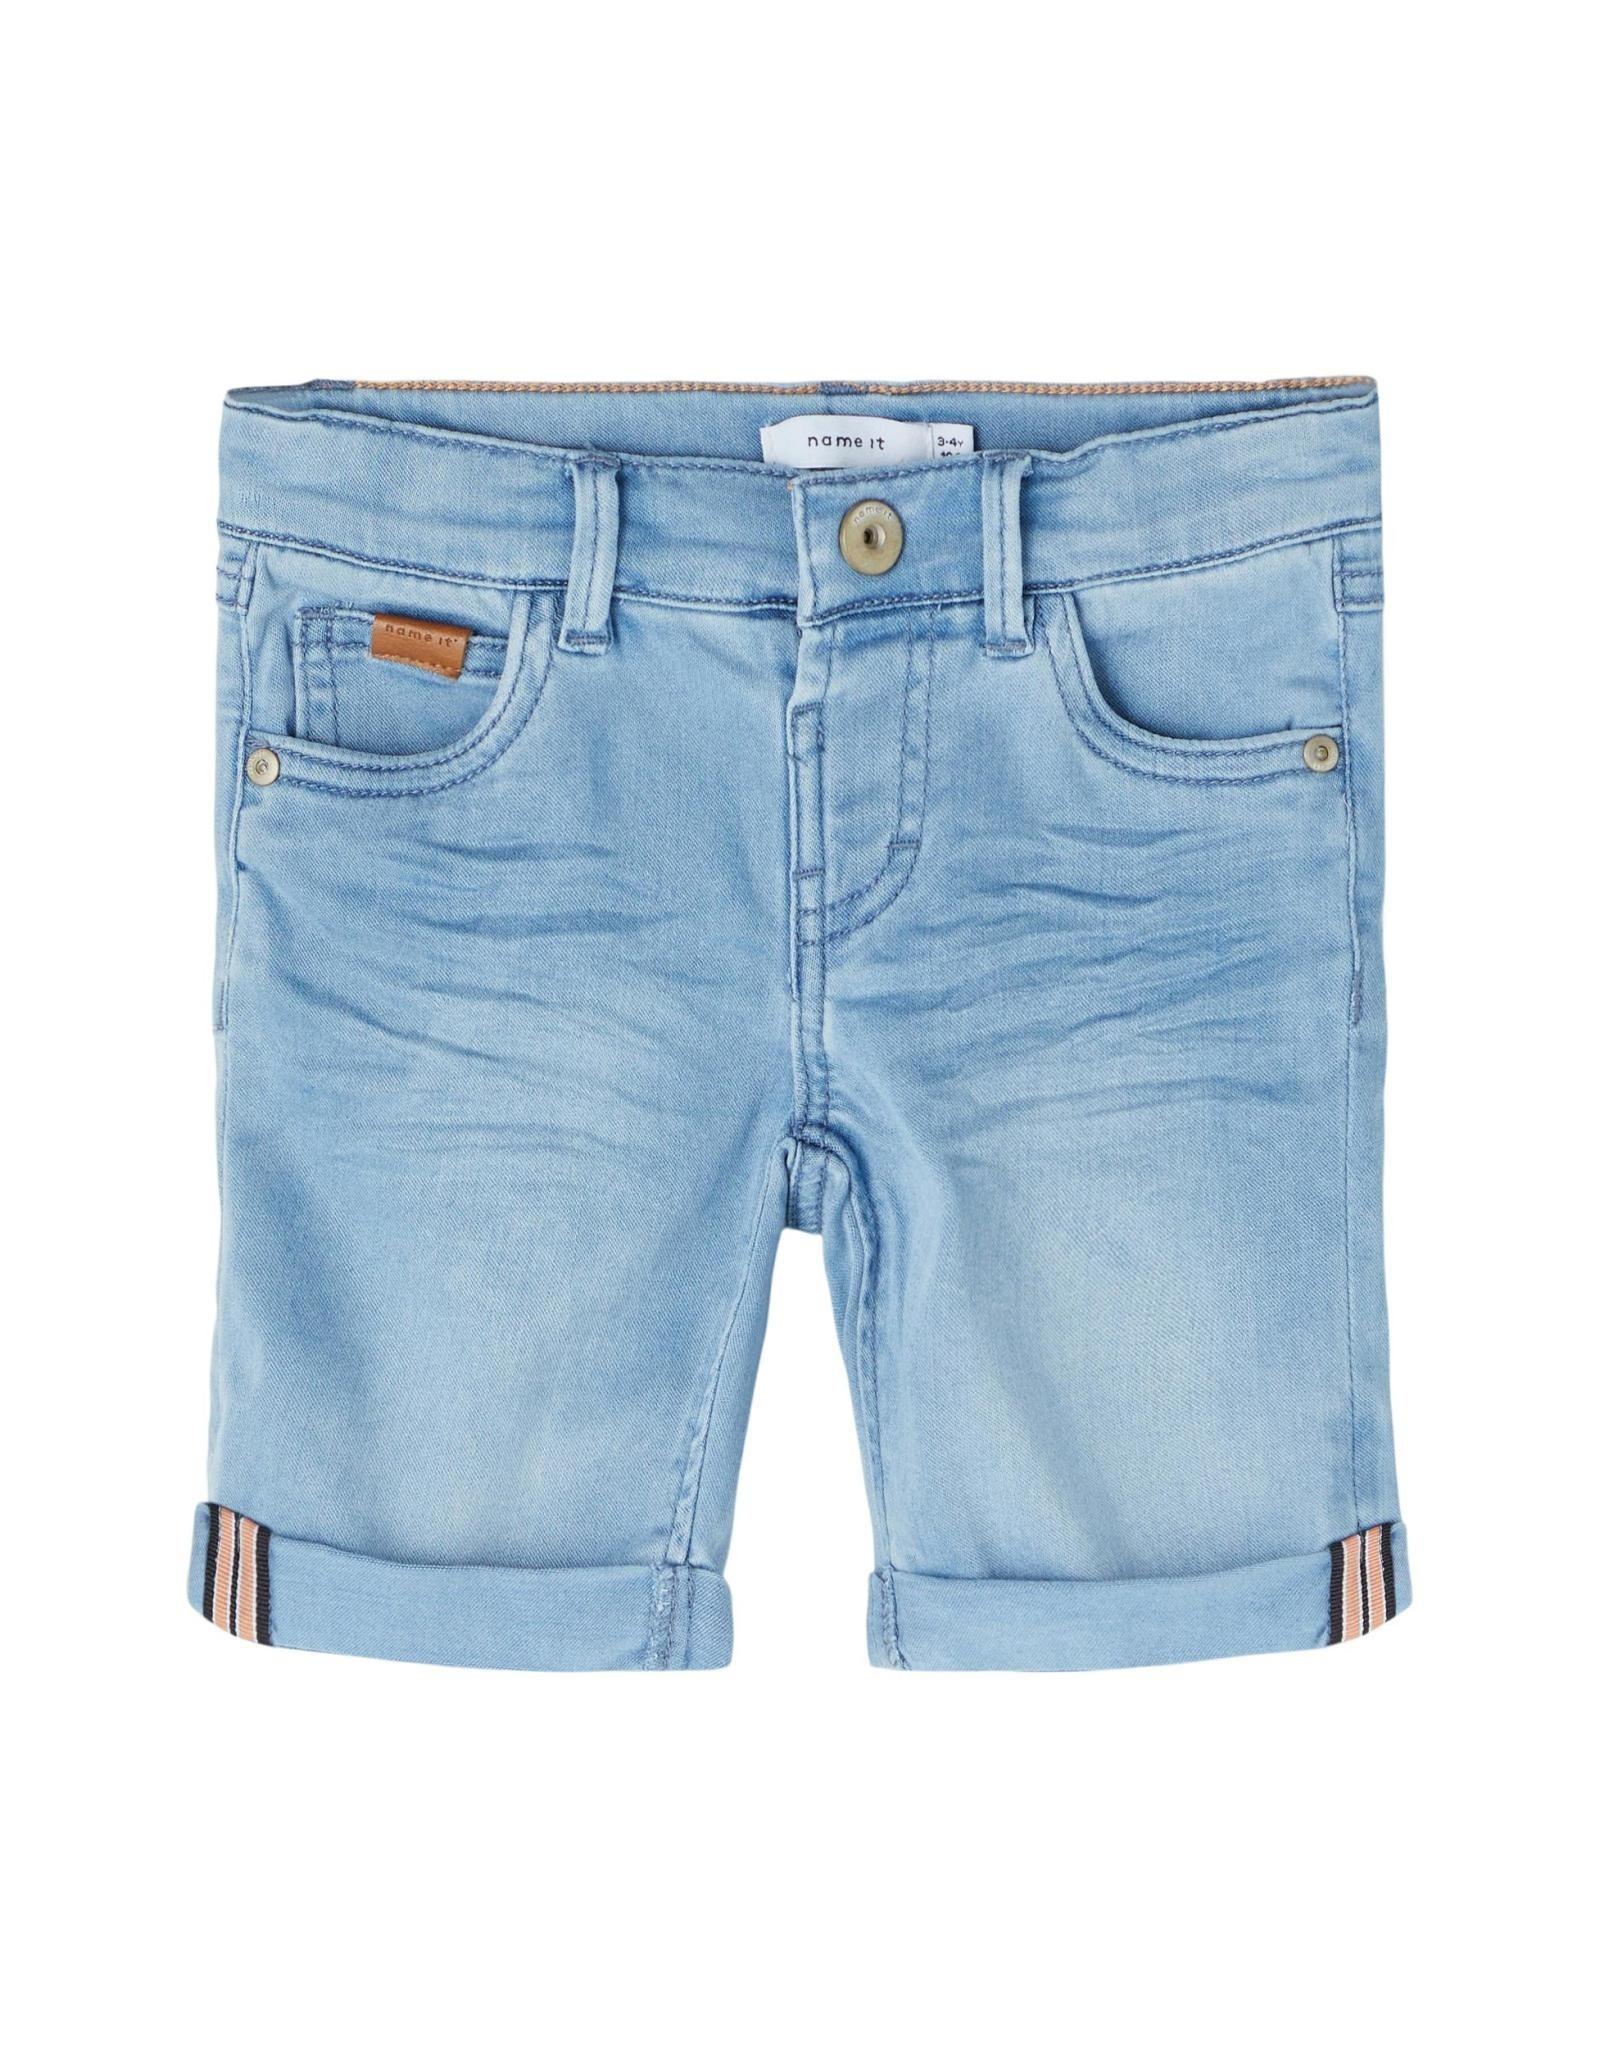 Name-it Denim long shorts